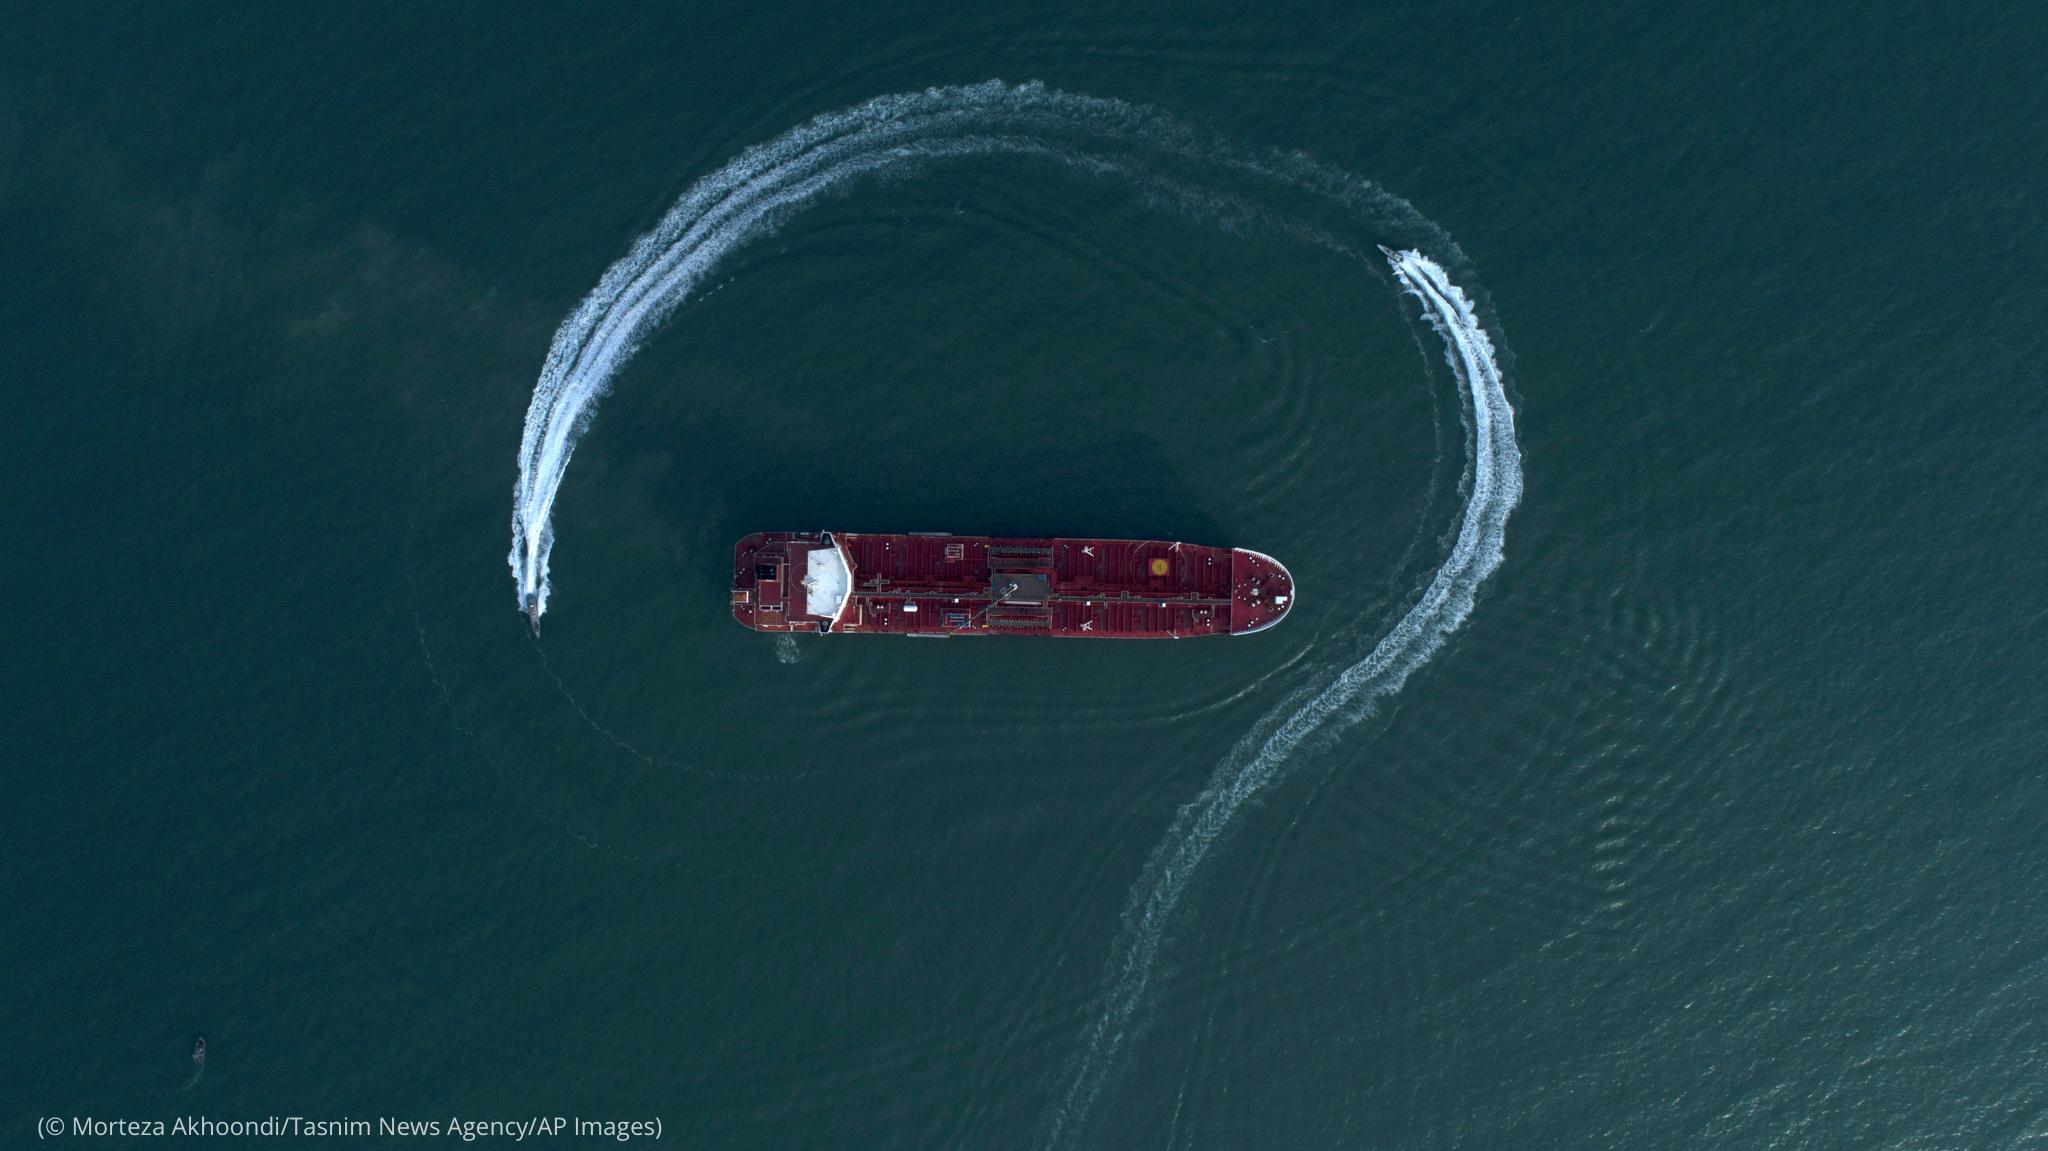 A vessel circling around an oil tanker (© Morteza Akhoondi/Tasnim News Agency/AP Images)